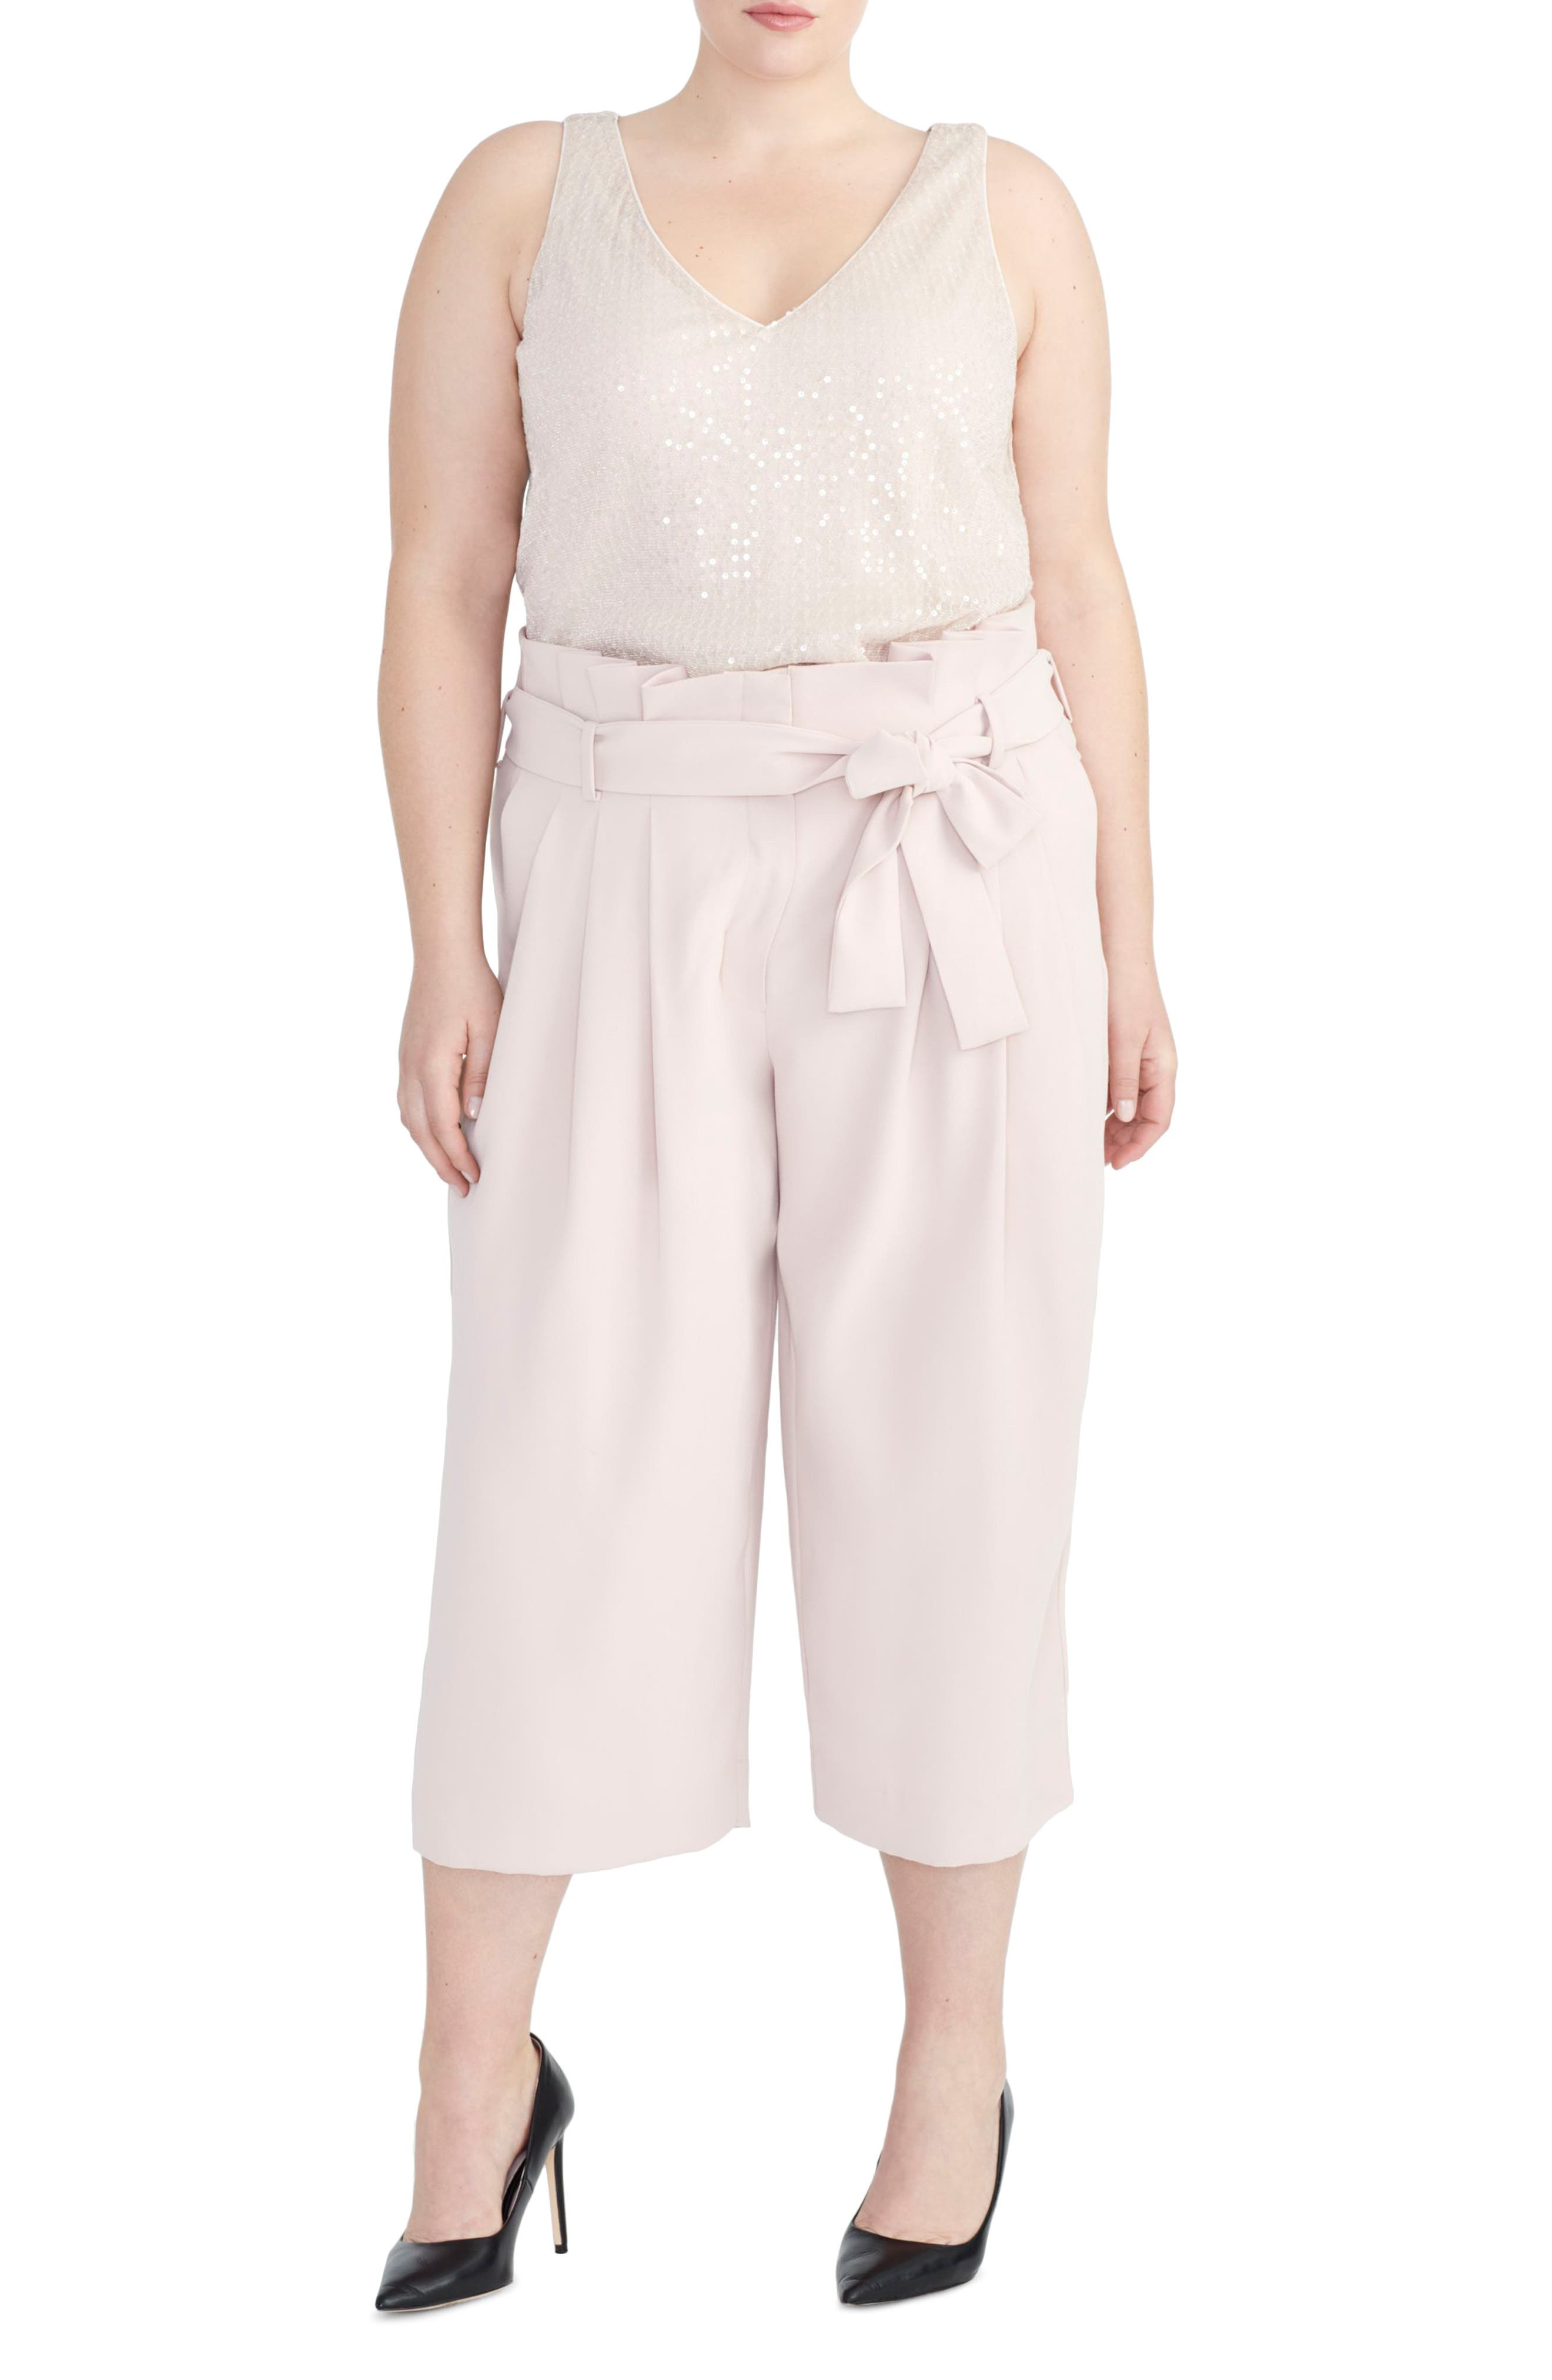 Plus Size Rachel Roy Collection Sequin Camisole, Pink